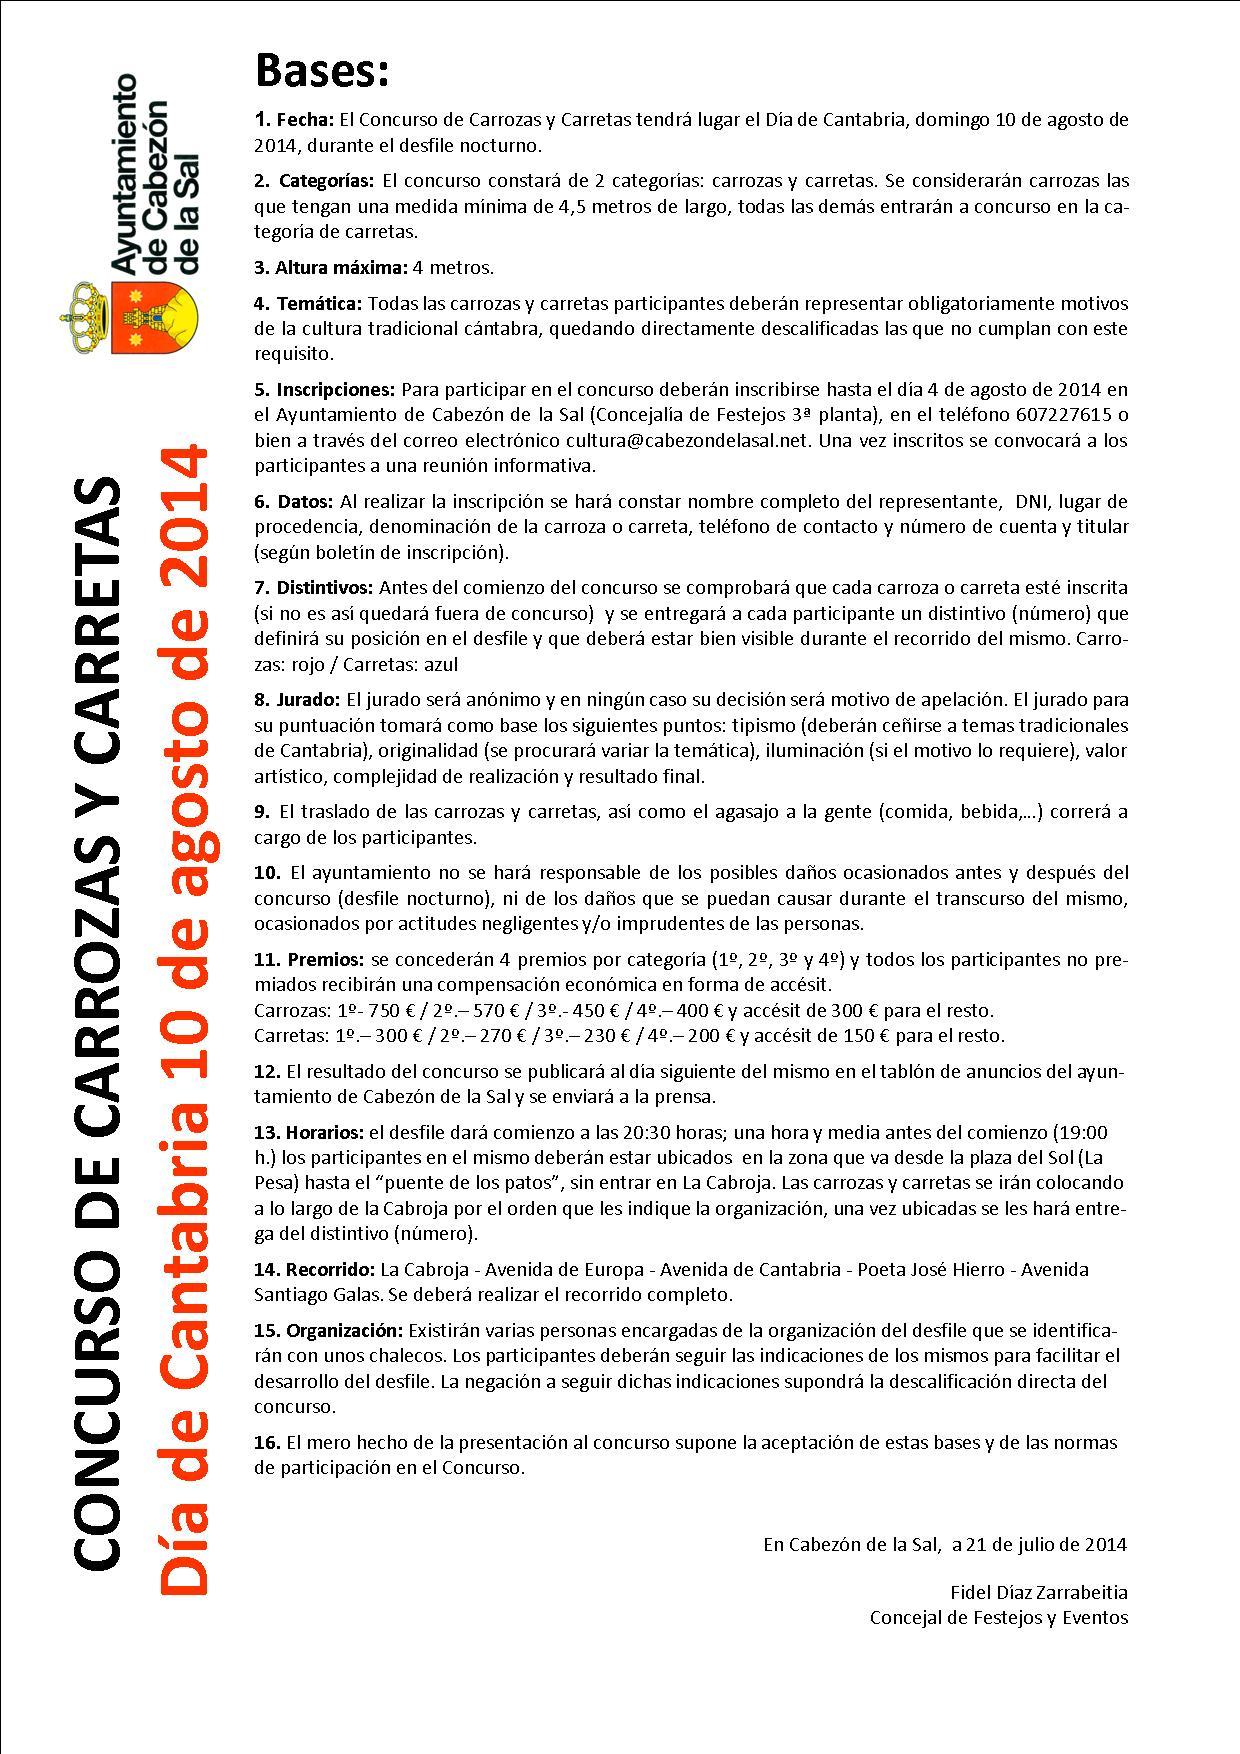 http://www.cabezondelasal.net/wp-content/uploads/2014/07/bases-concurso-carrozas-y-carretas-2014.jpg